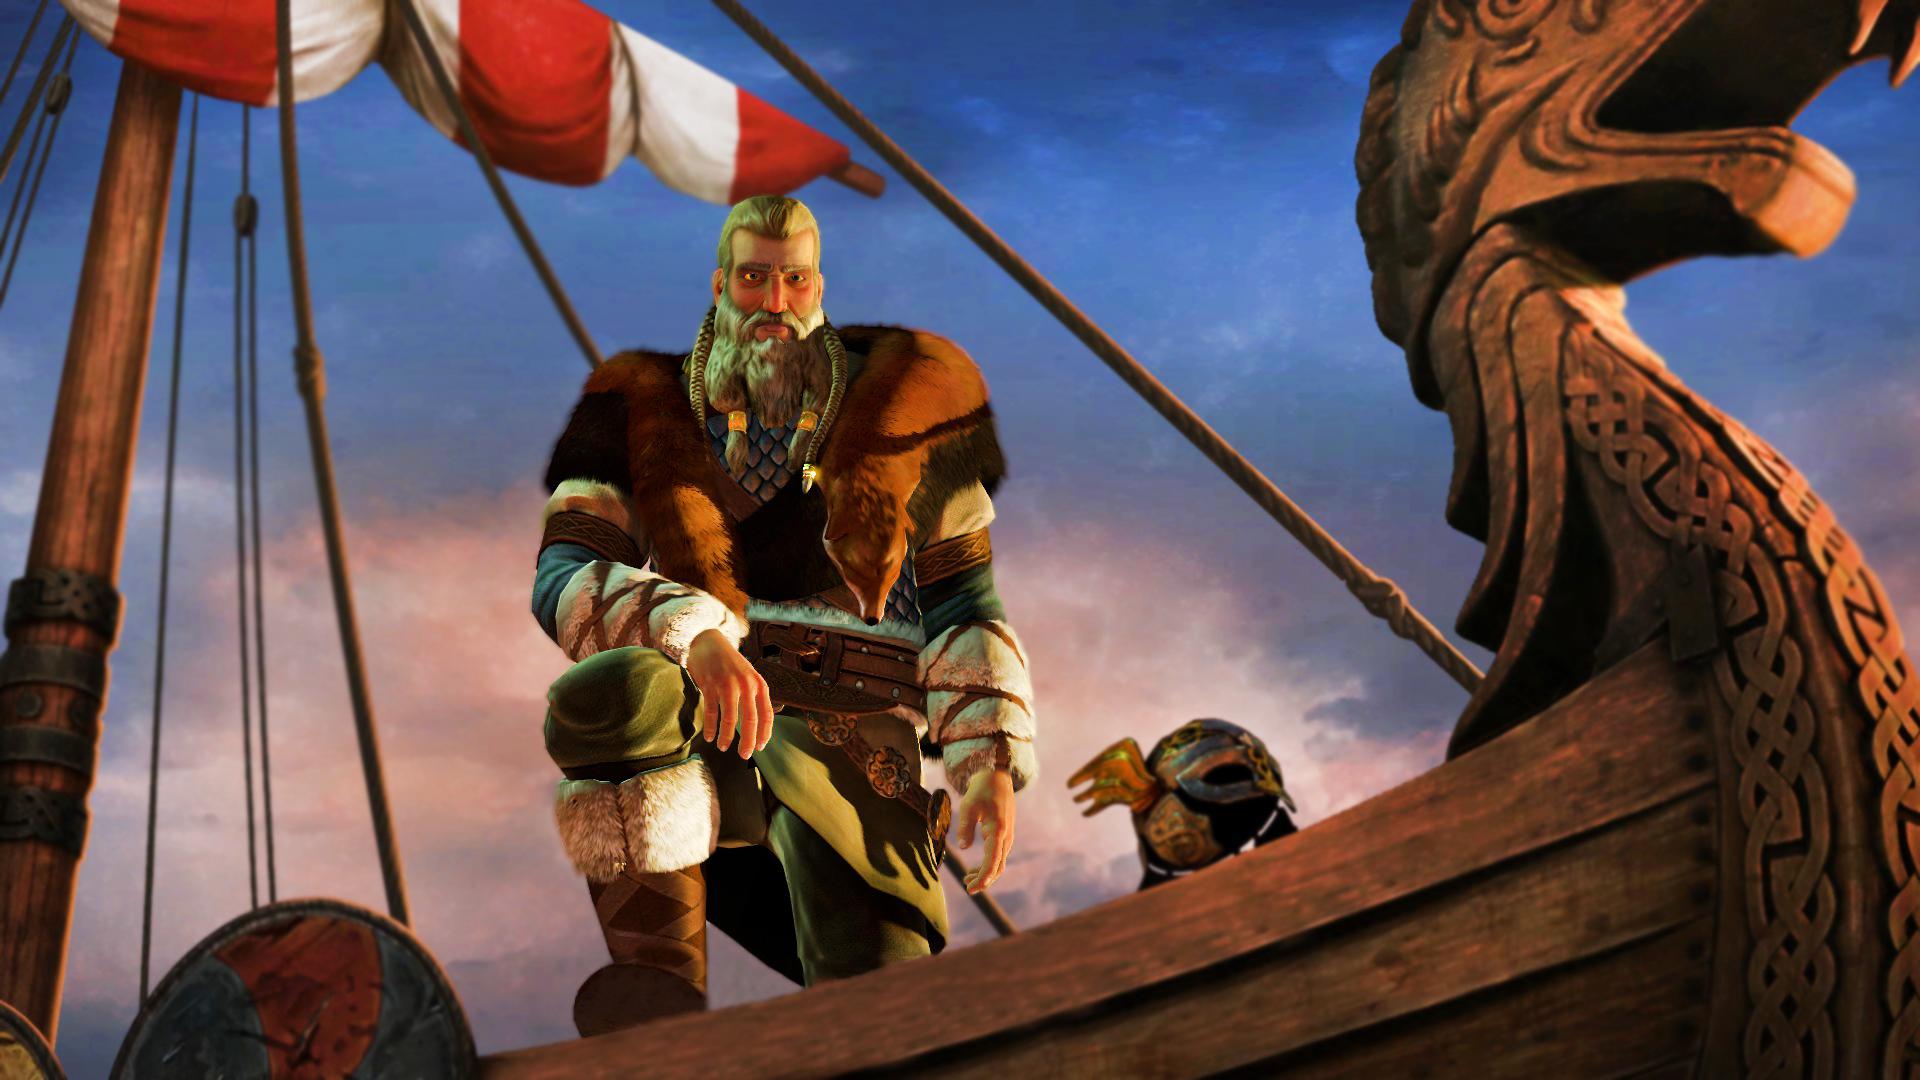 Vikings Civ 6